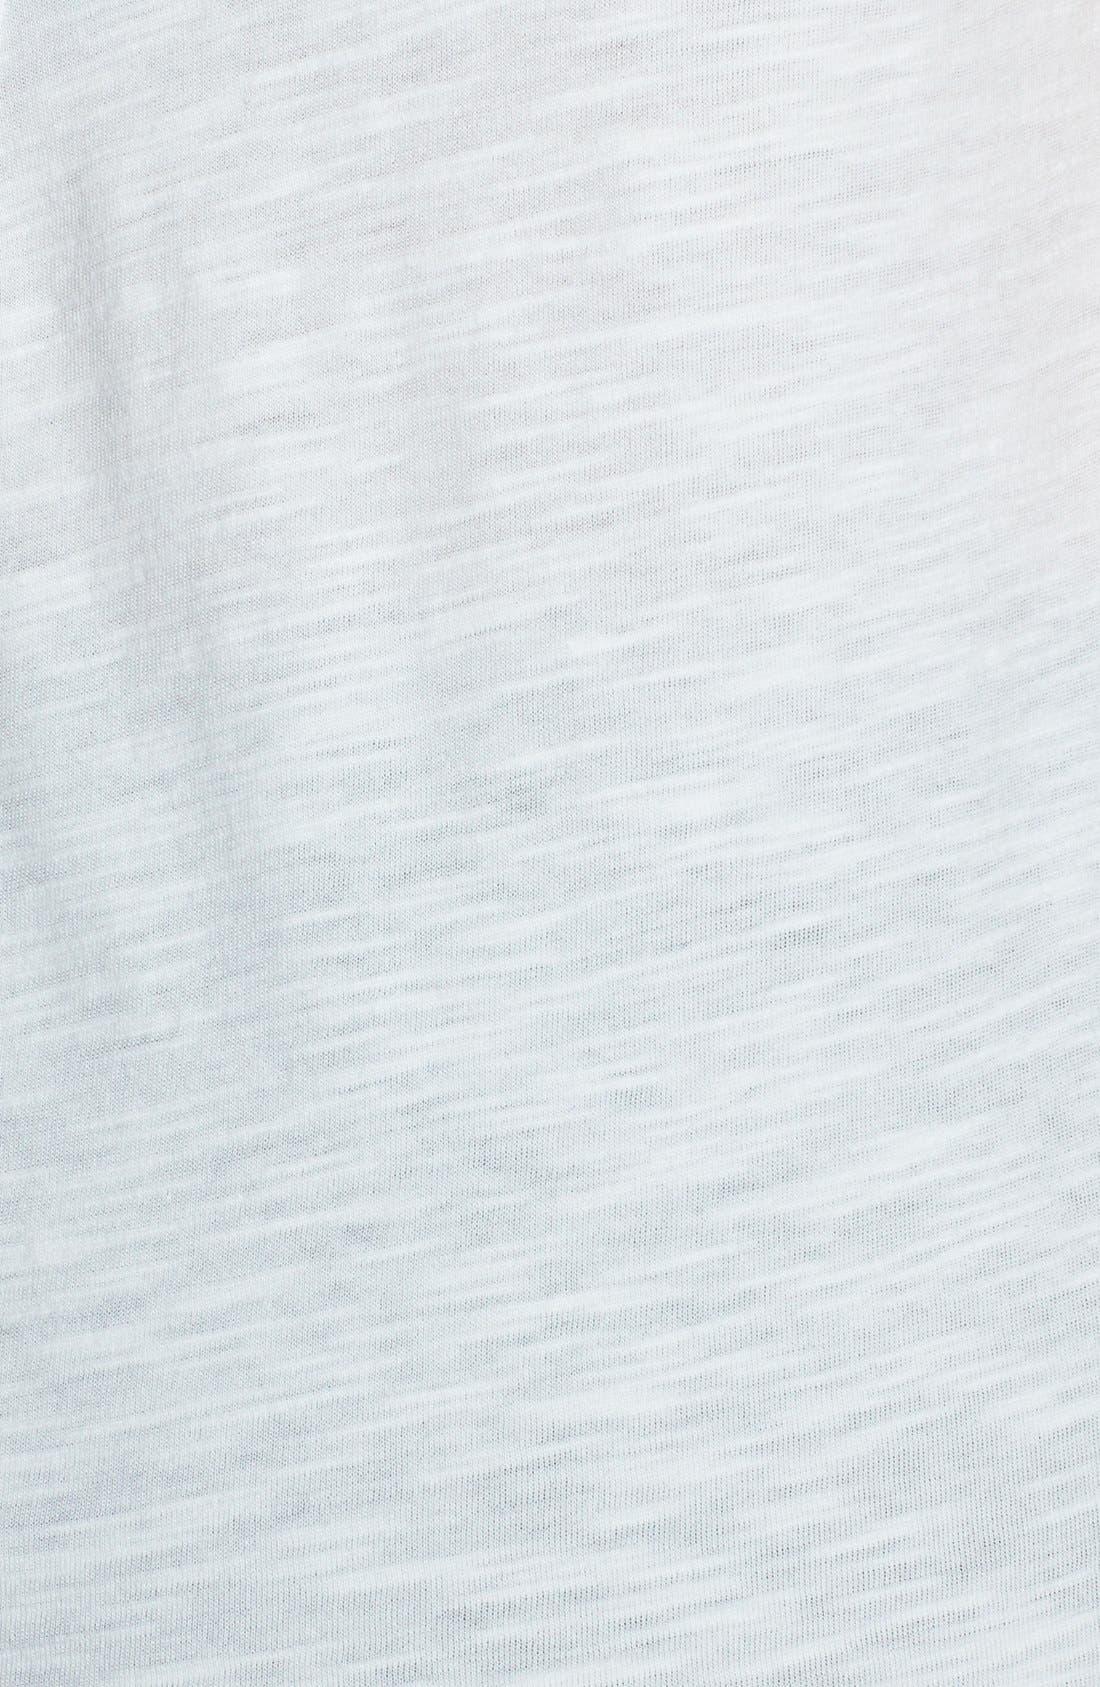 Alternate Image 3  - adidas Originals 'Indie - Dance Till Dawn' Graphic Cutout Tank